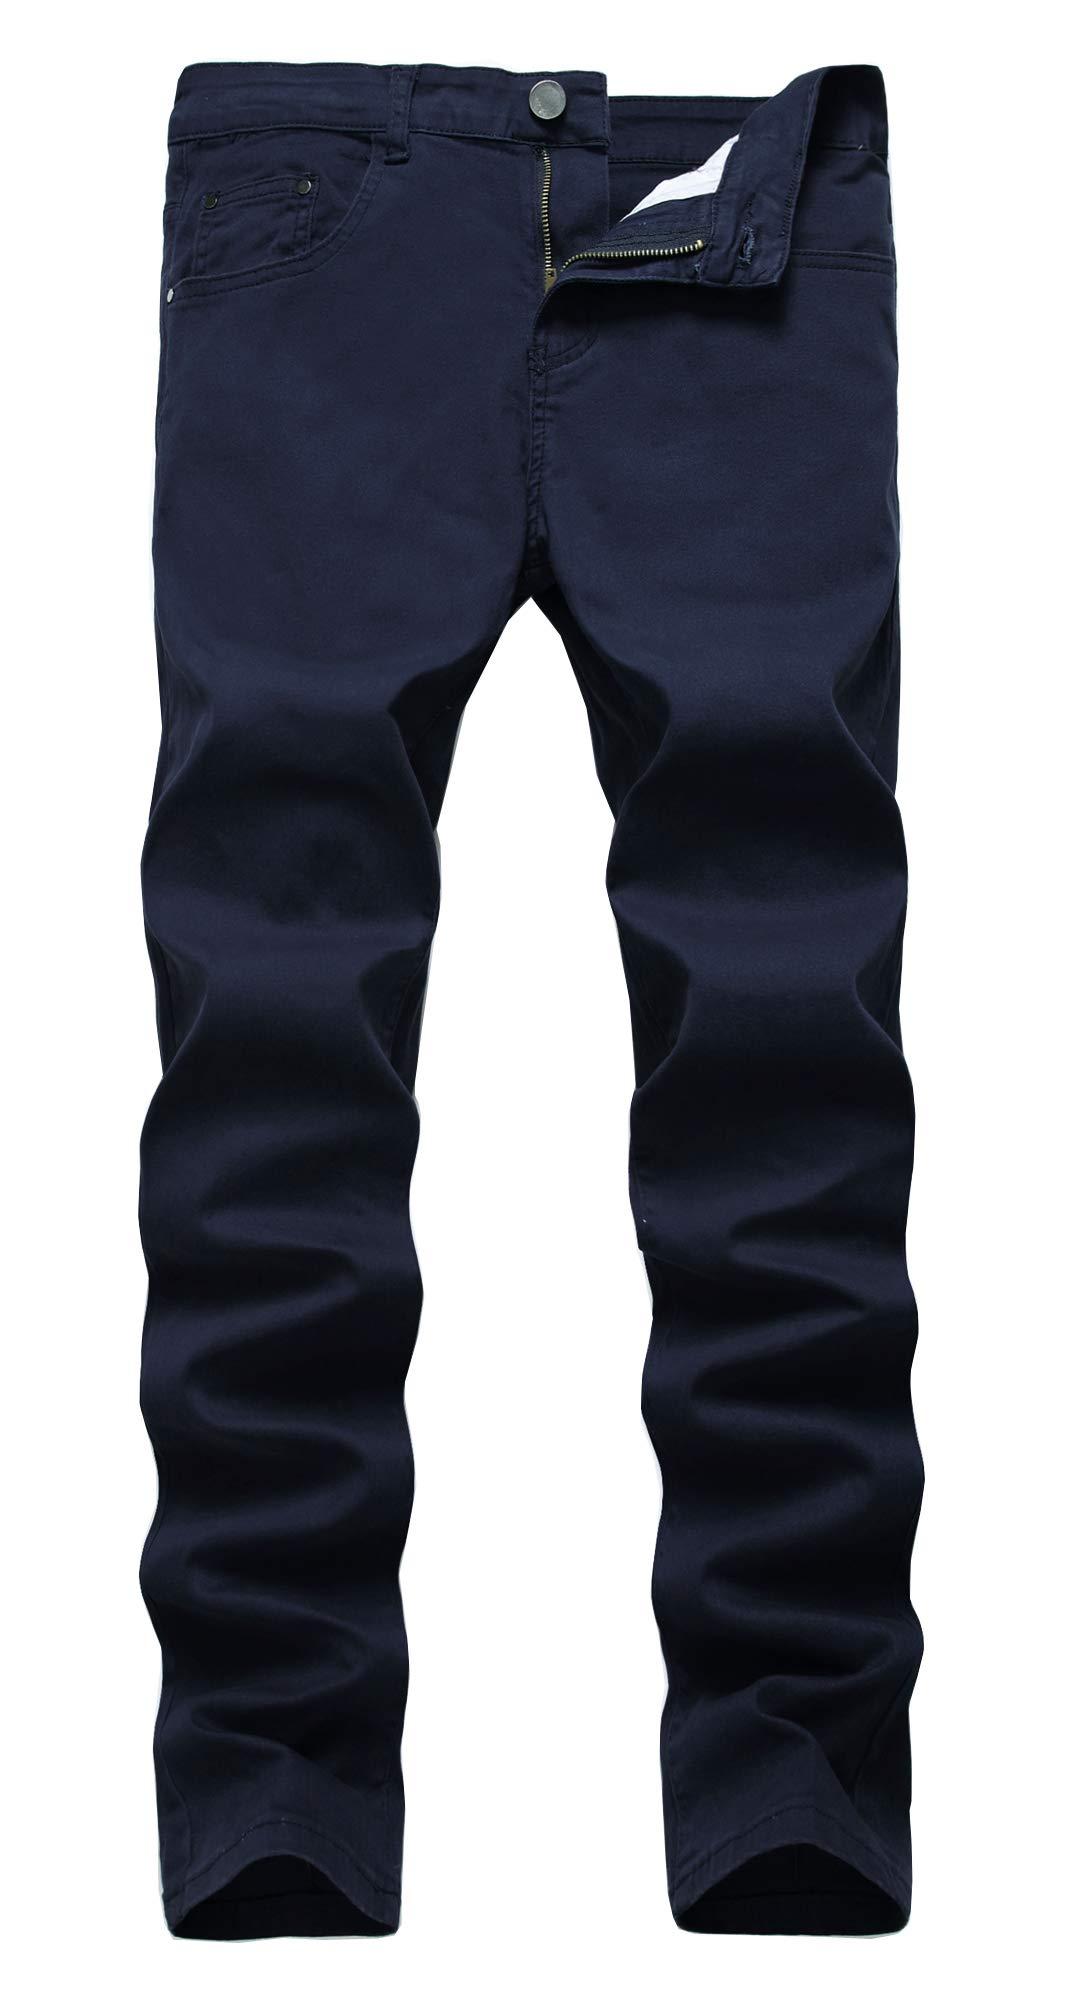 NITAGUT Men's Skinny Slim Fit Stretch Comfy Fashion Denim Jeans Pants (US 33, Dark Blue)